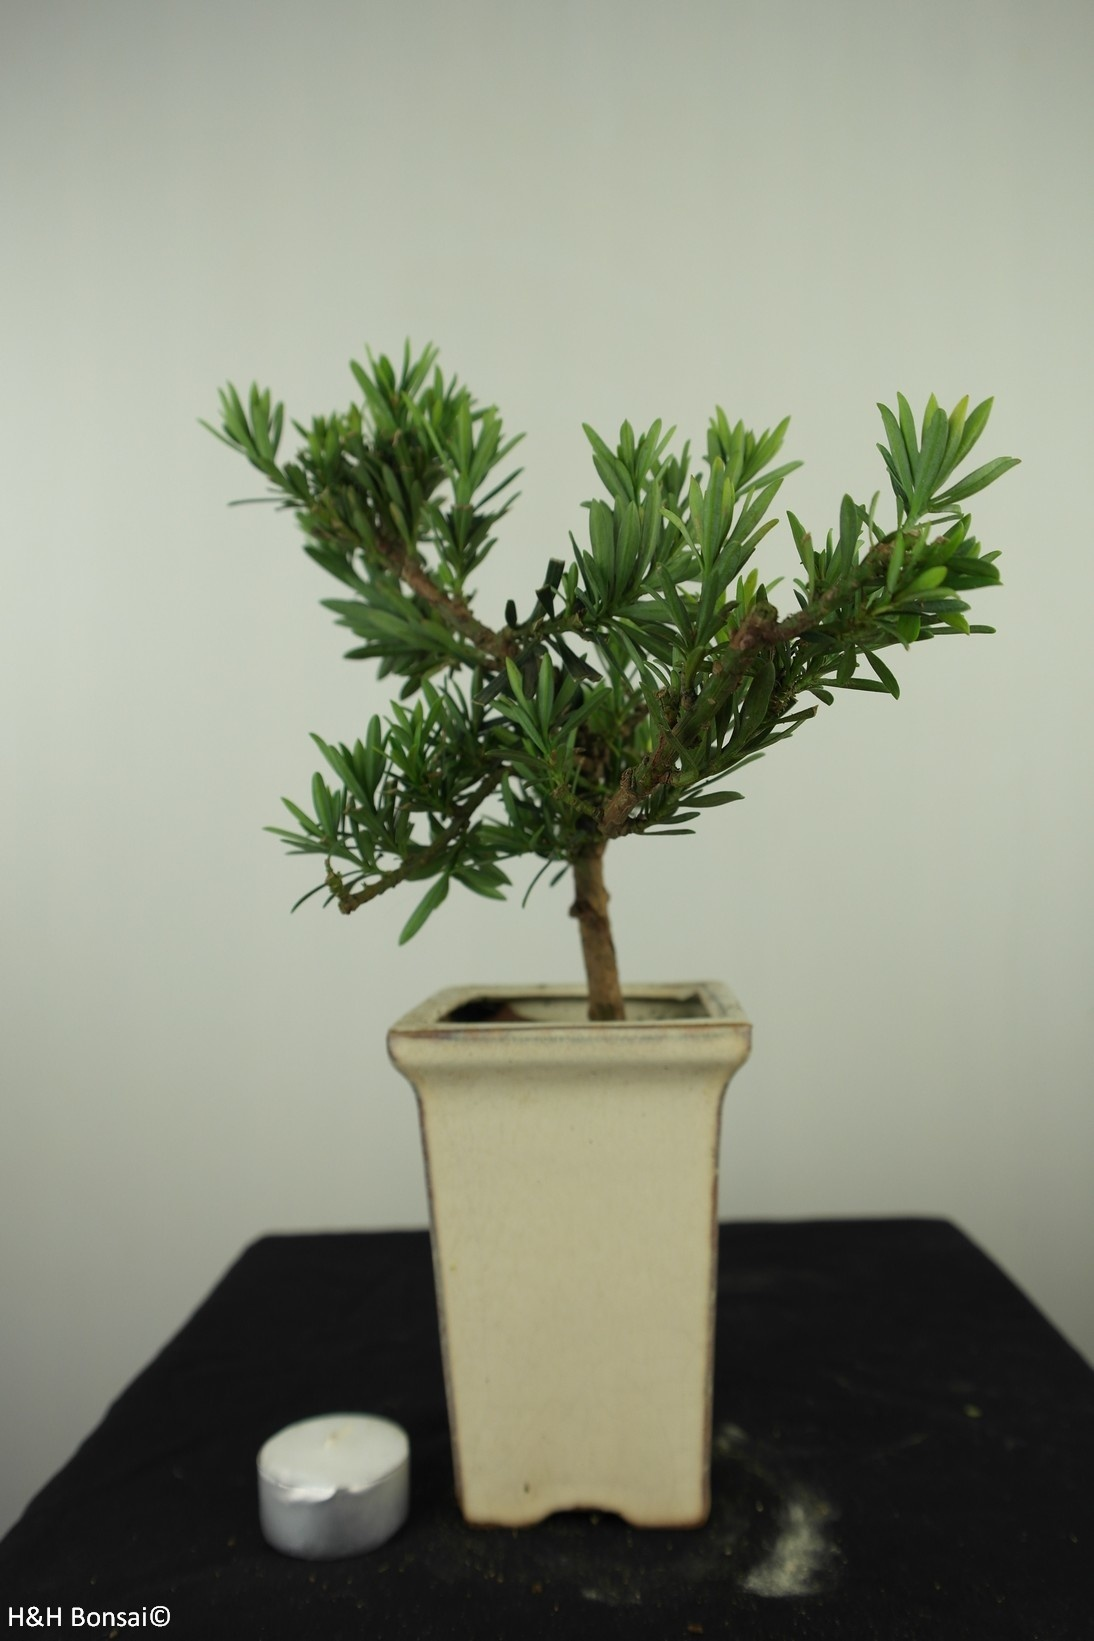 Bonsai Chin. Steineibe, Podocarpus, nr. 7599